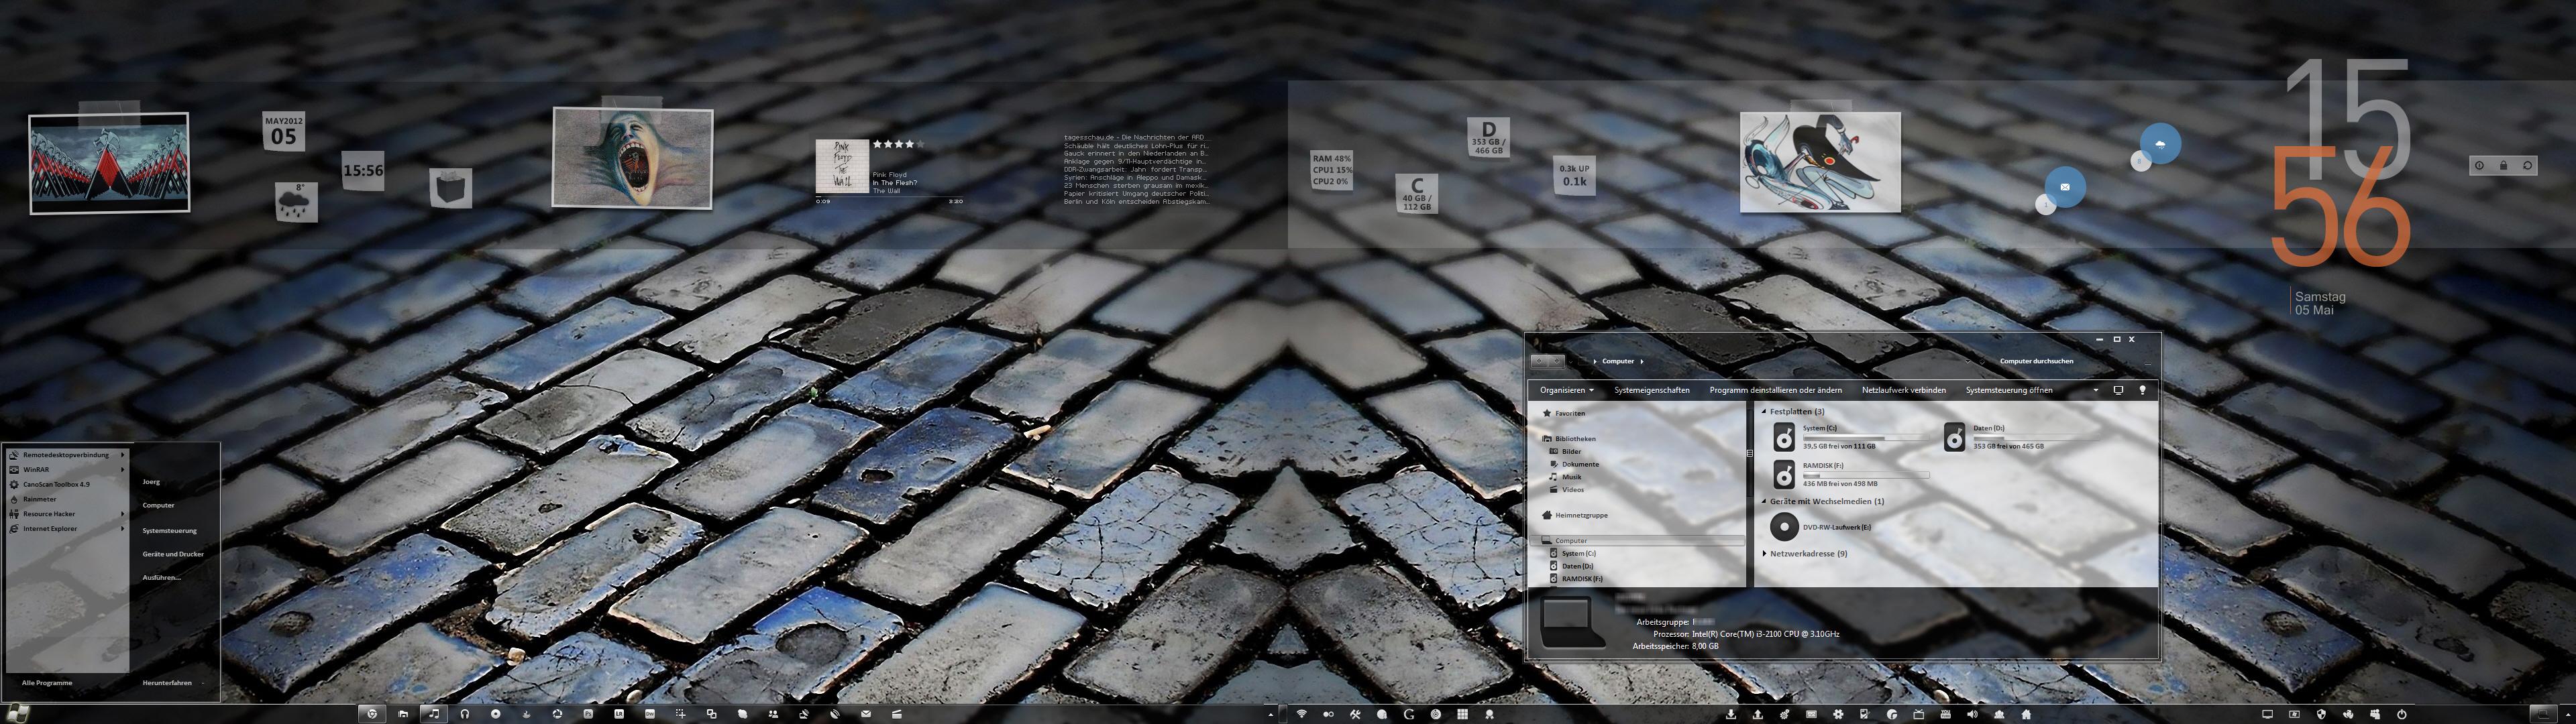 Pimp My Desktop Part 25 by Joergermeister